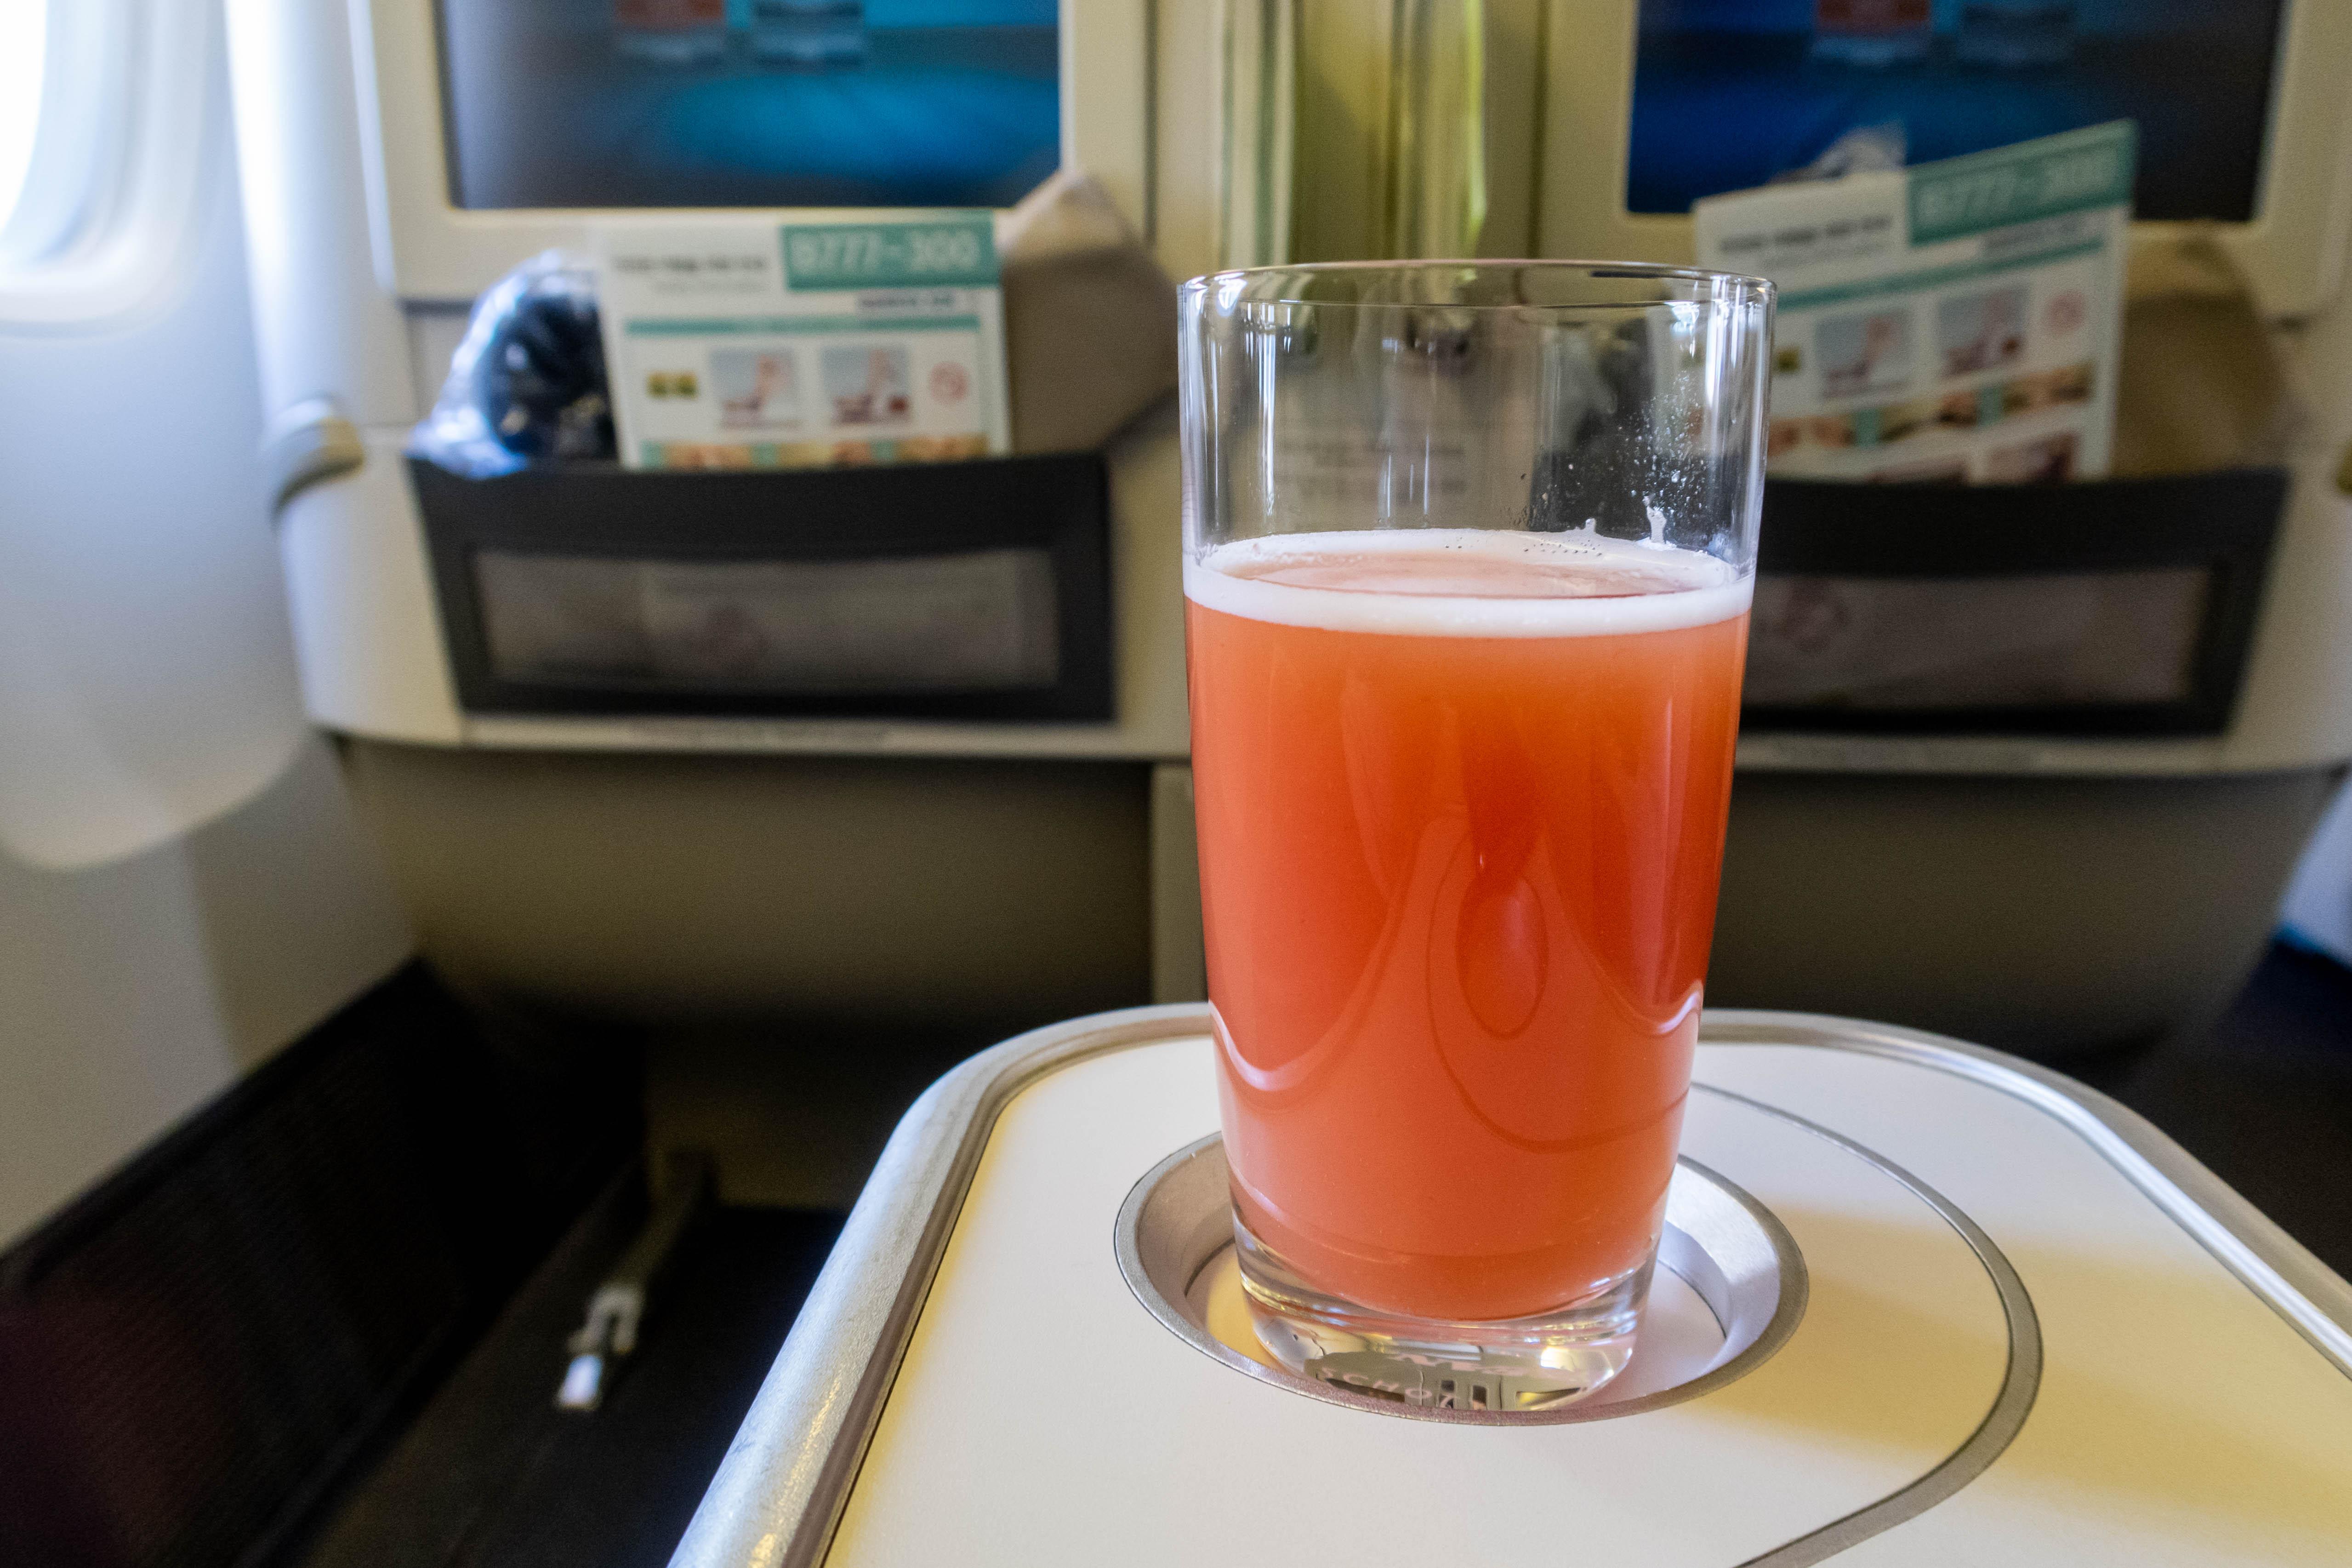 Korean Air Business Class Welcome Drink